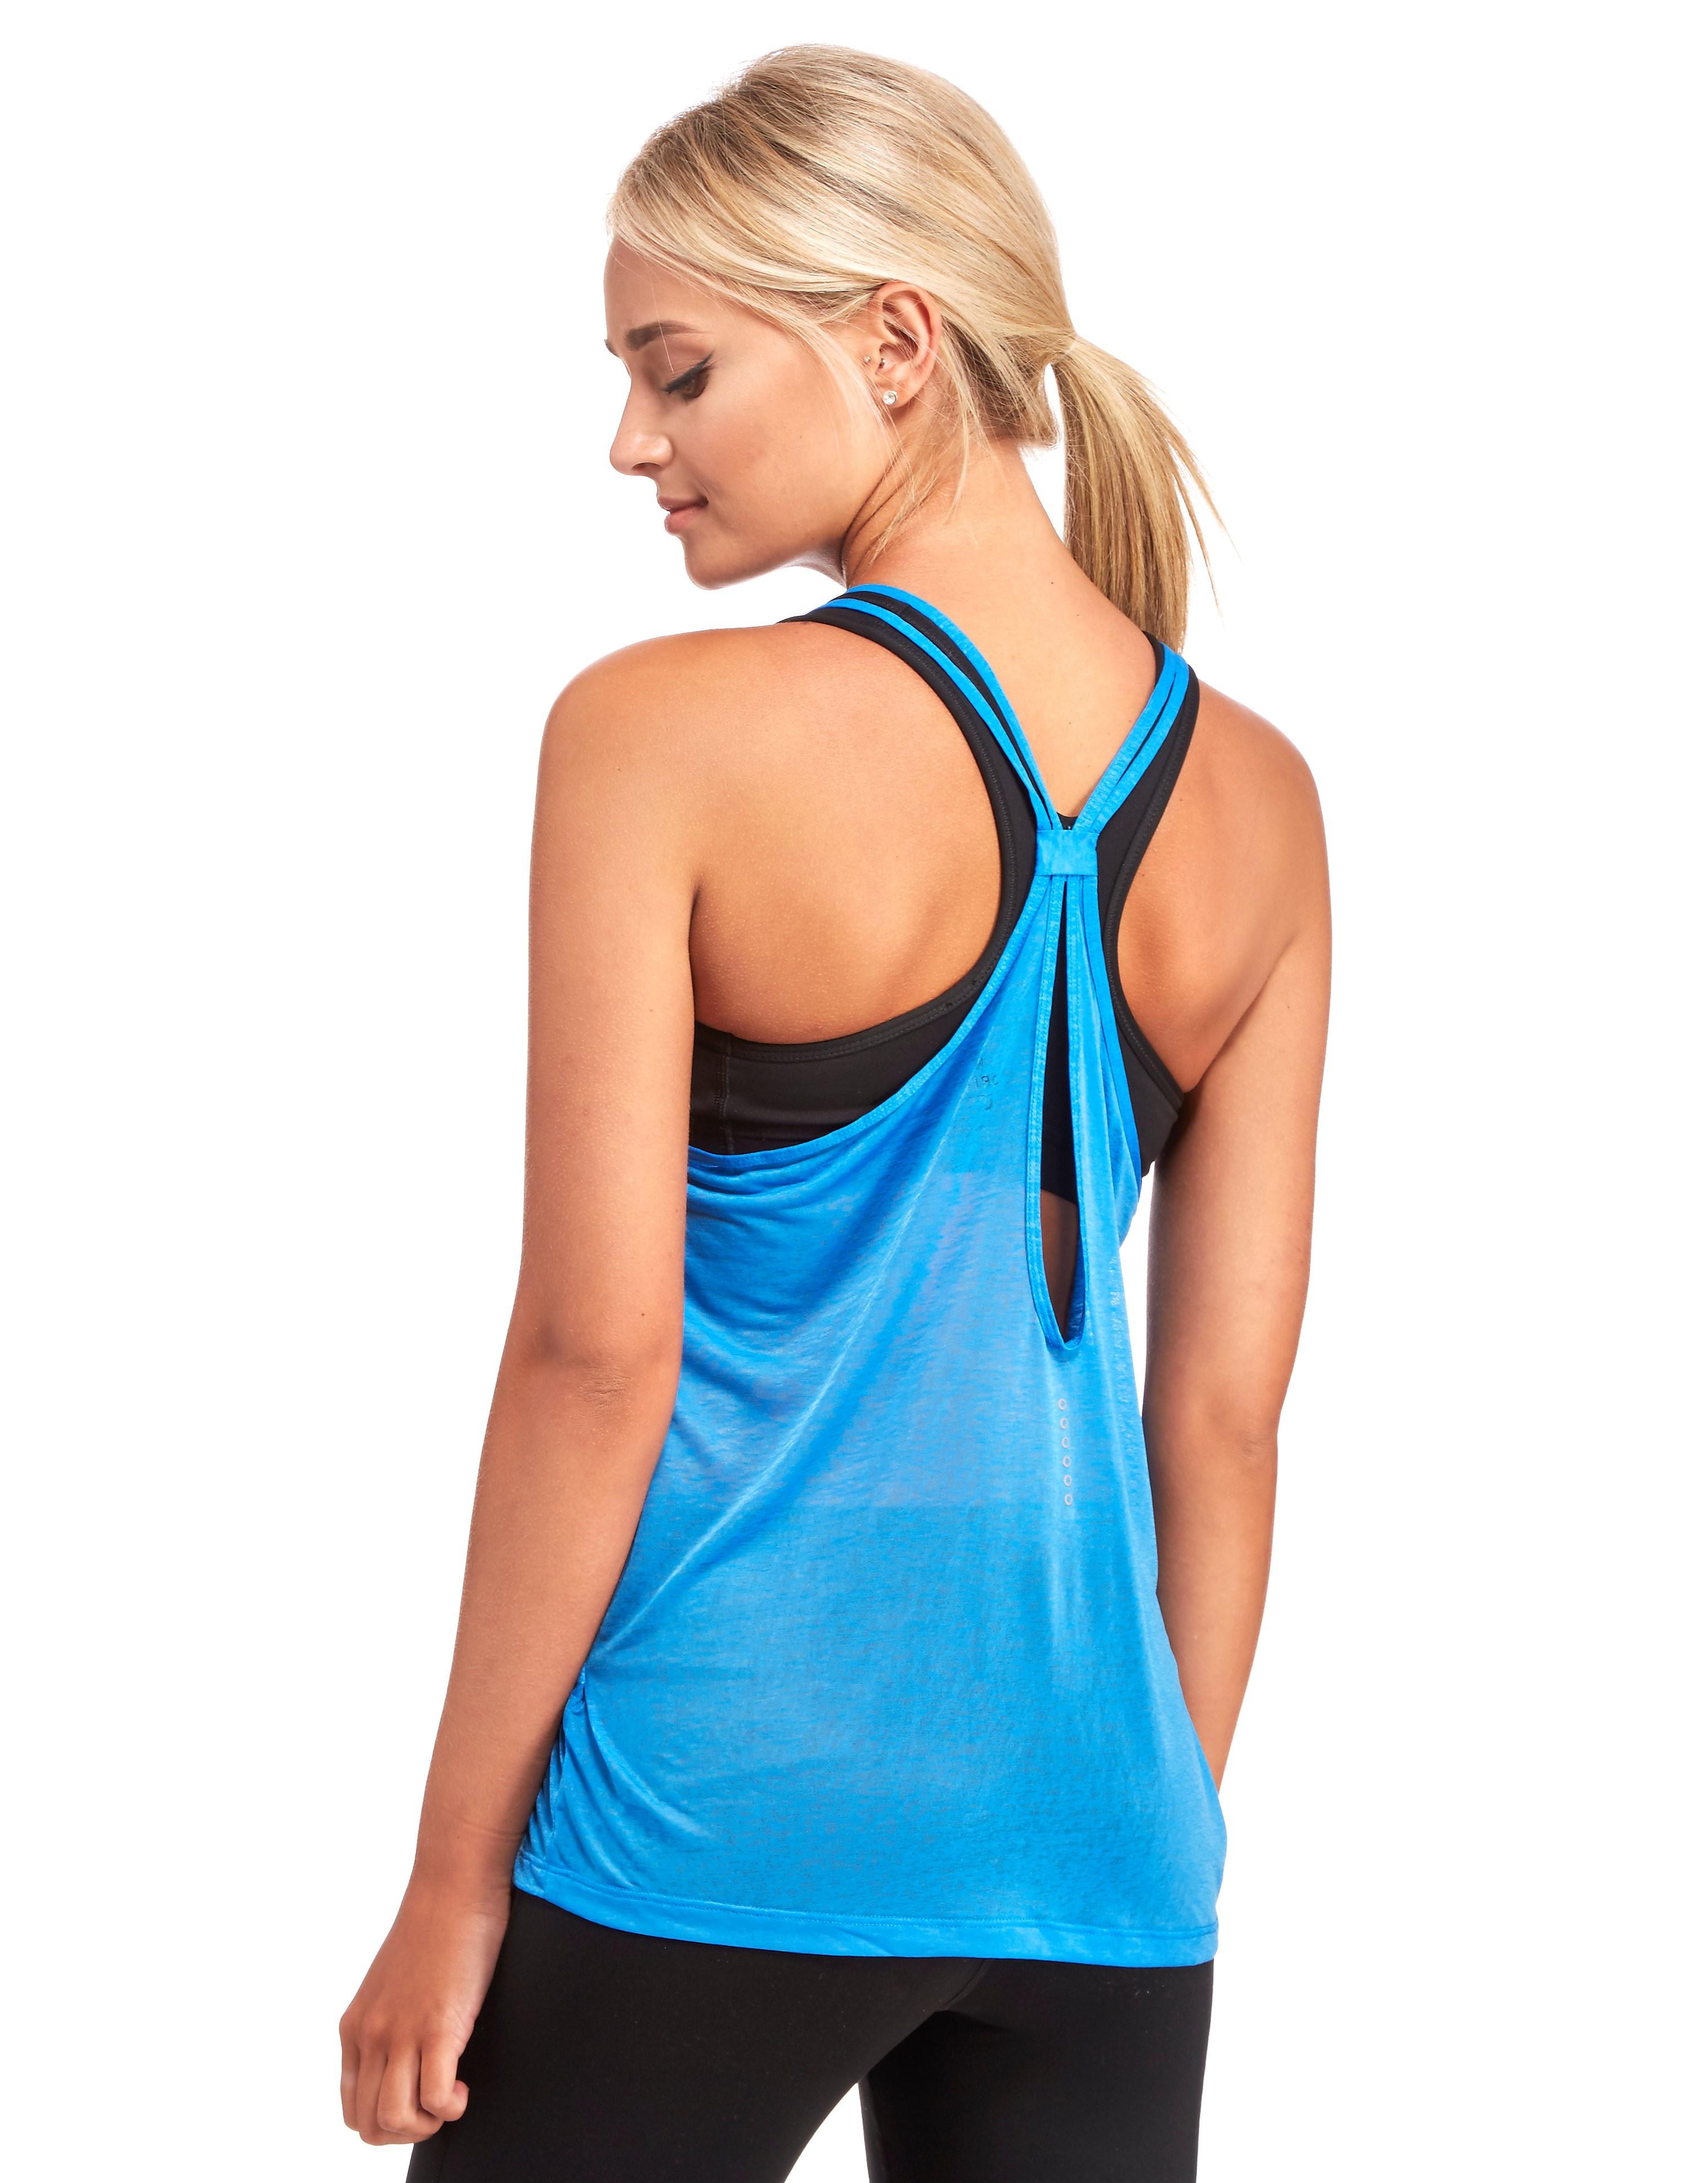 Nike Cool Breeze Strappy Tank Top